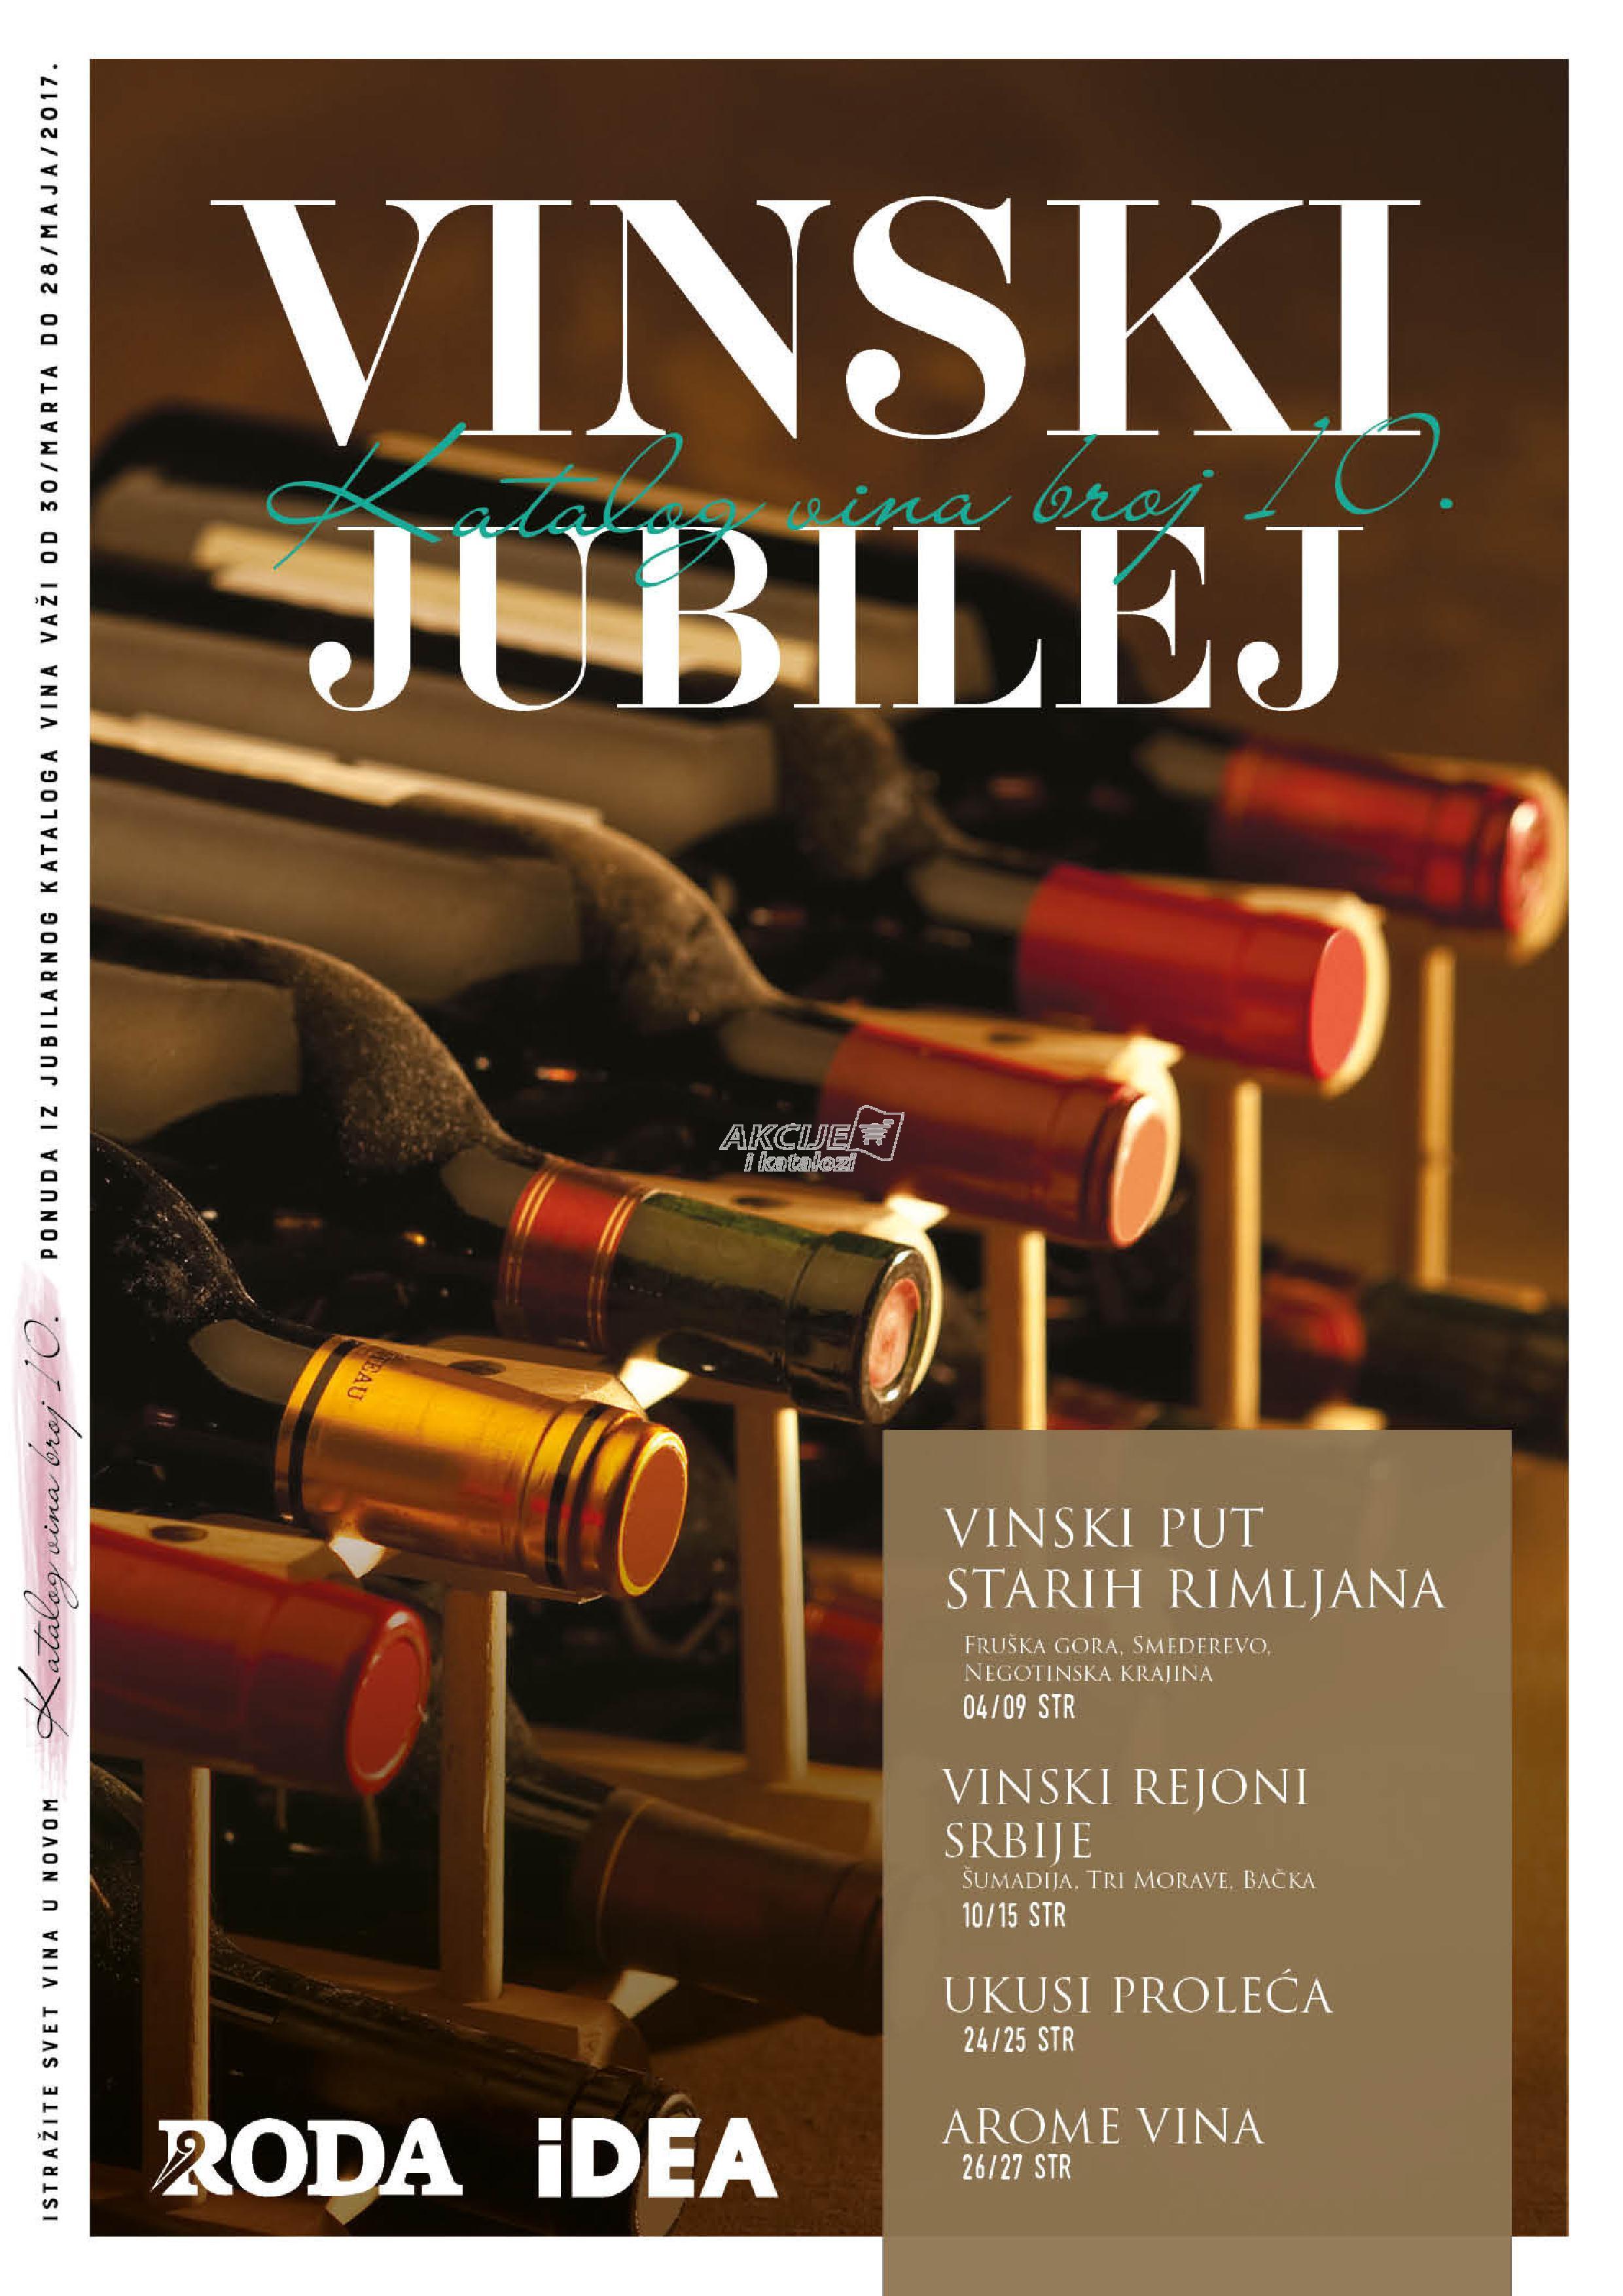 Roda - Redovna akcija super cene vina